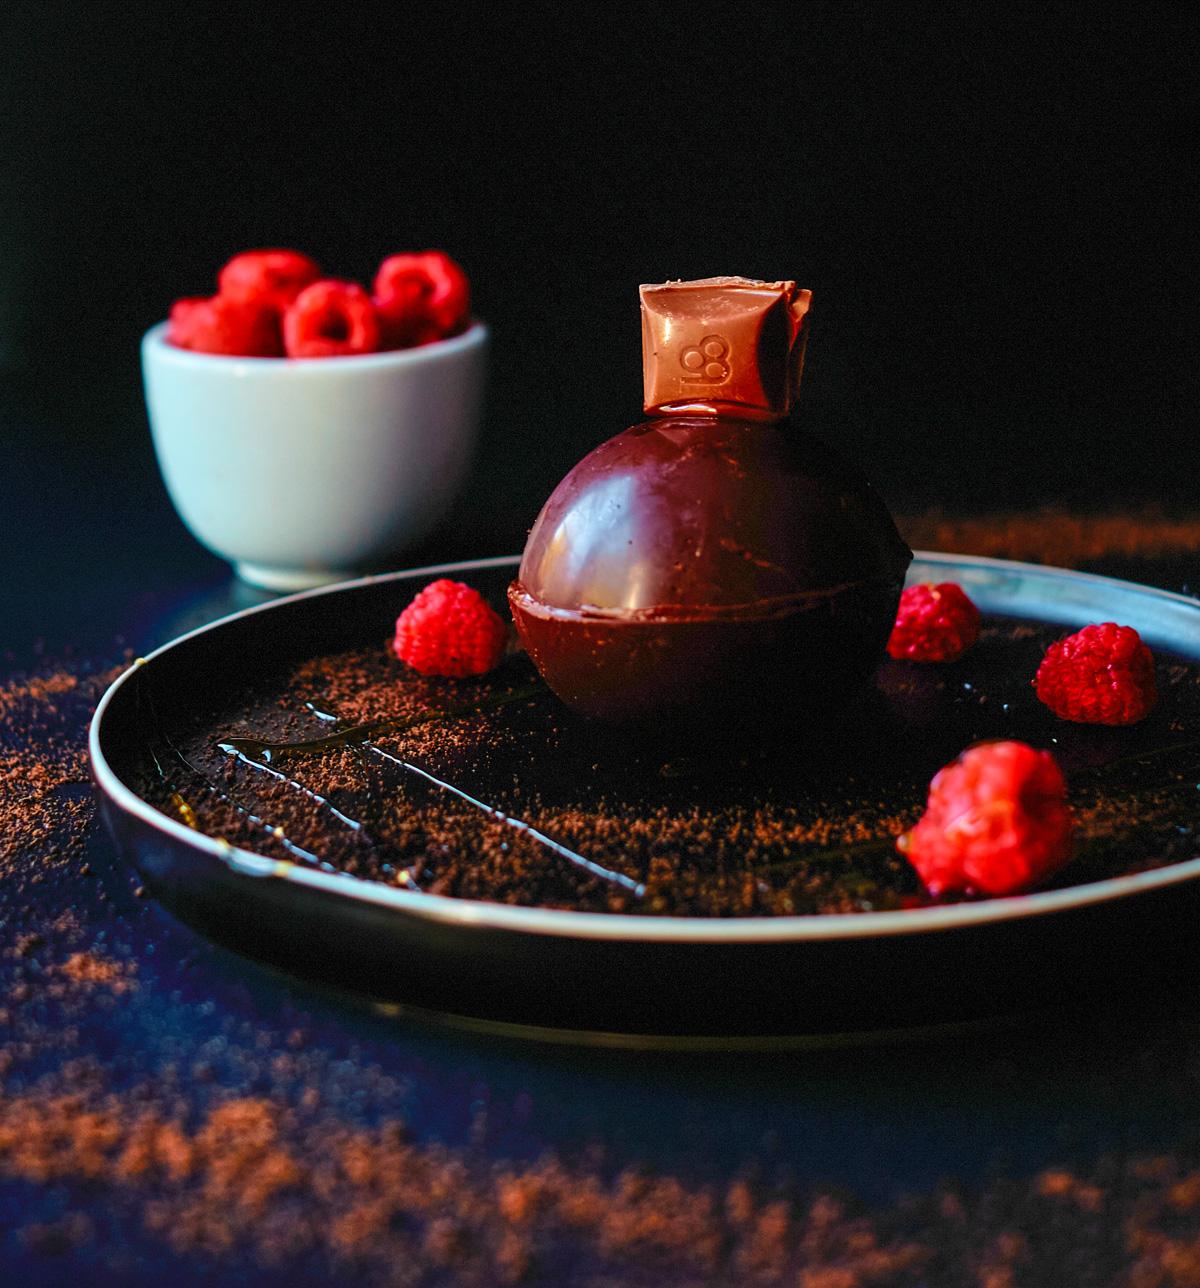 magic chocolate ball with raspberries, caramel sauce and caramilk piece